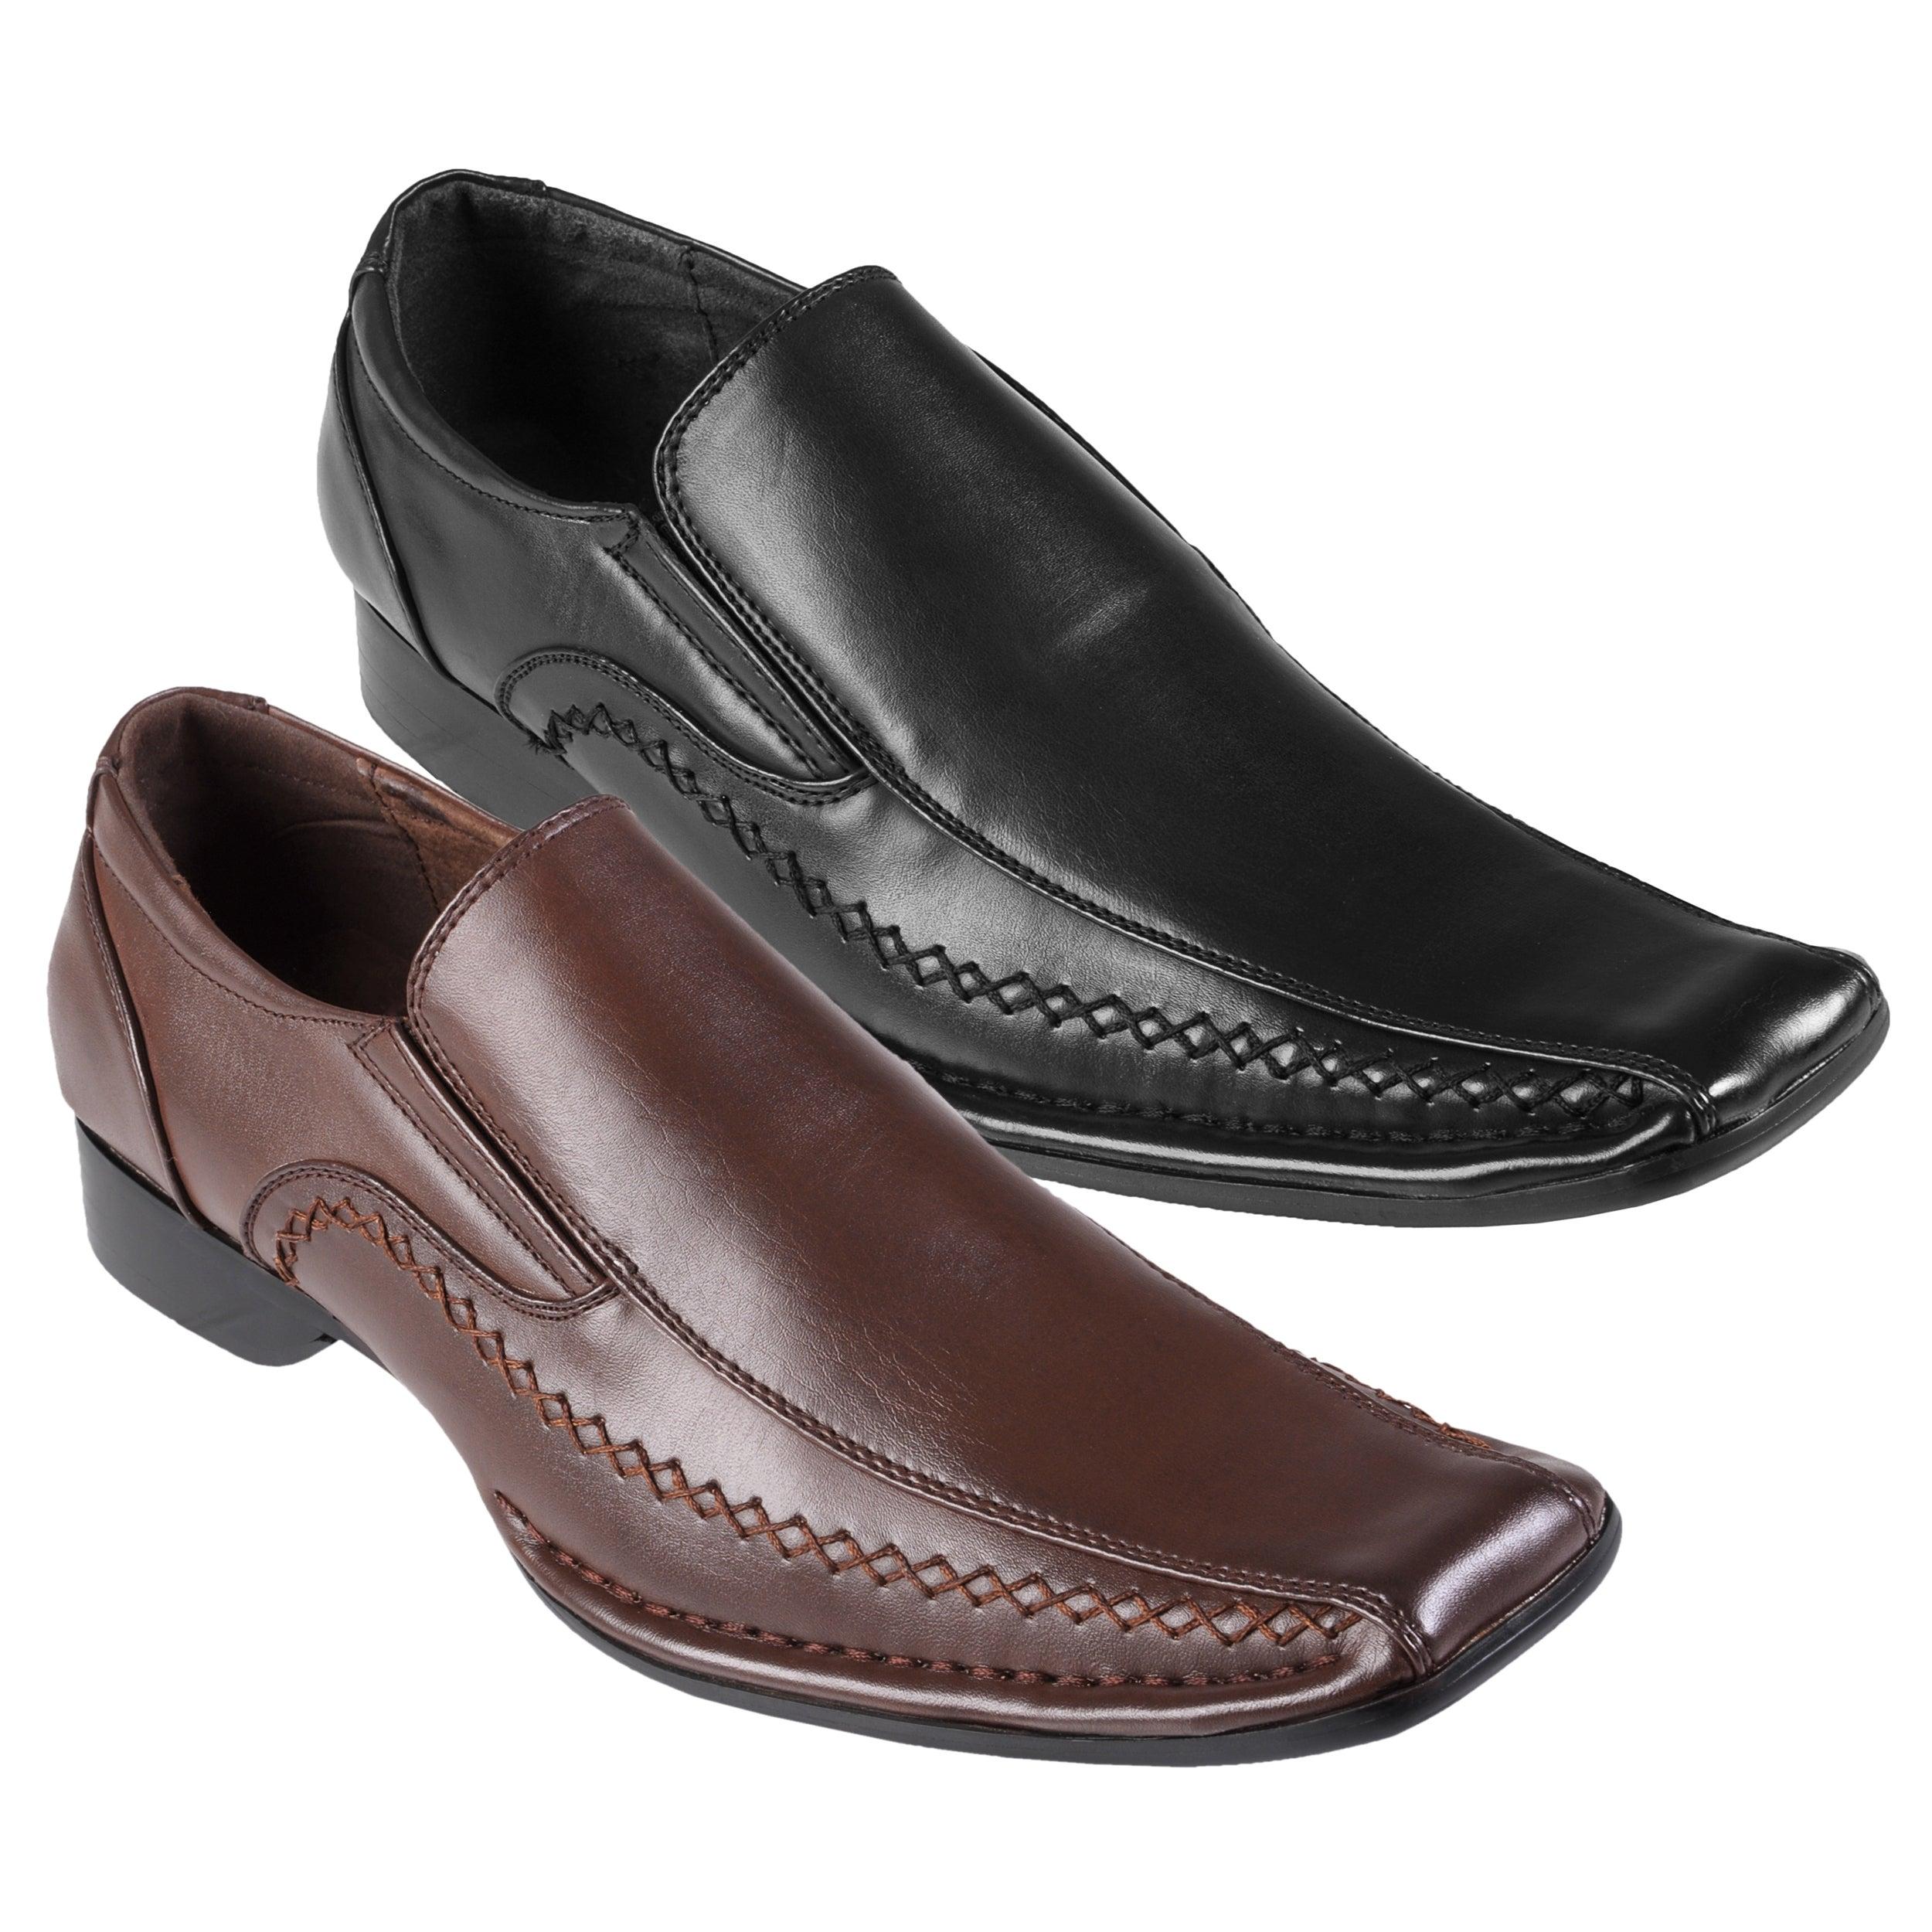 Boston Traveler Men's Stitch Detail Square Toe Slip-on Loafers